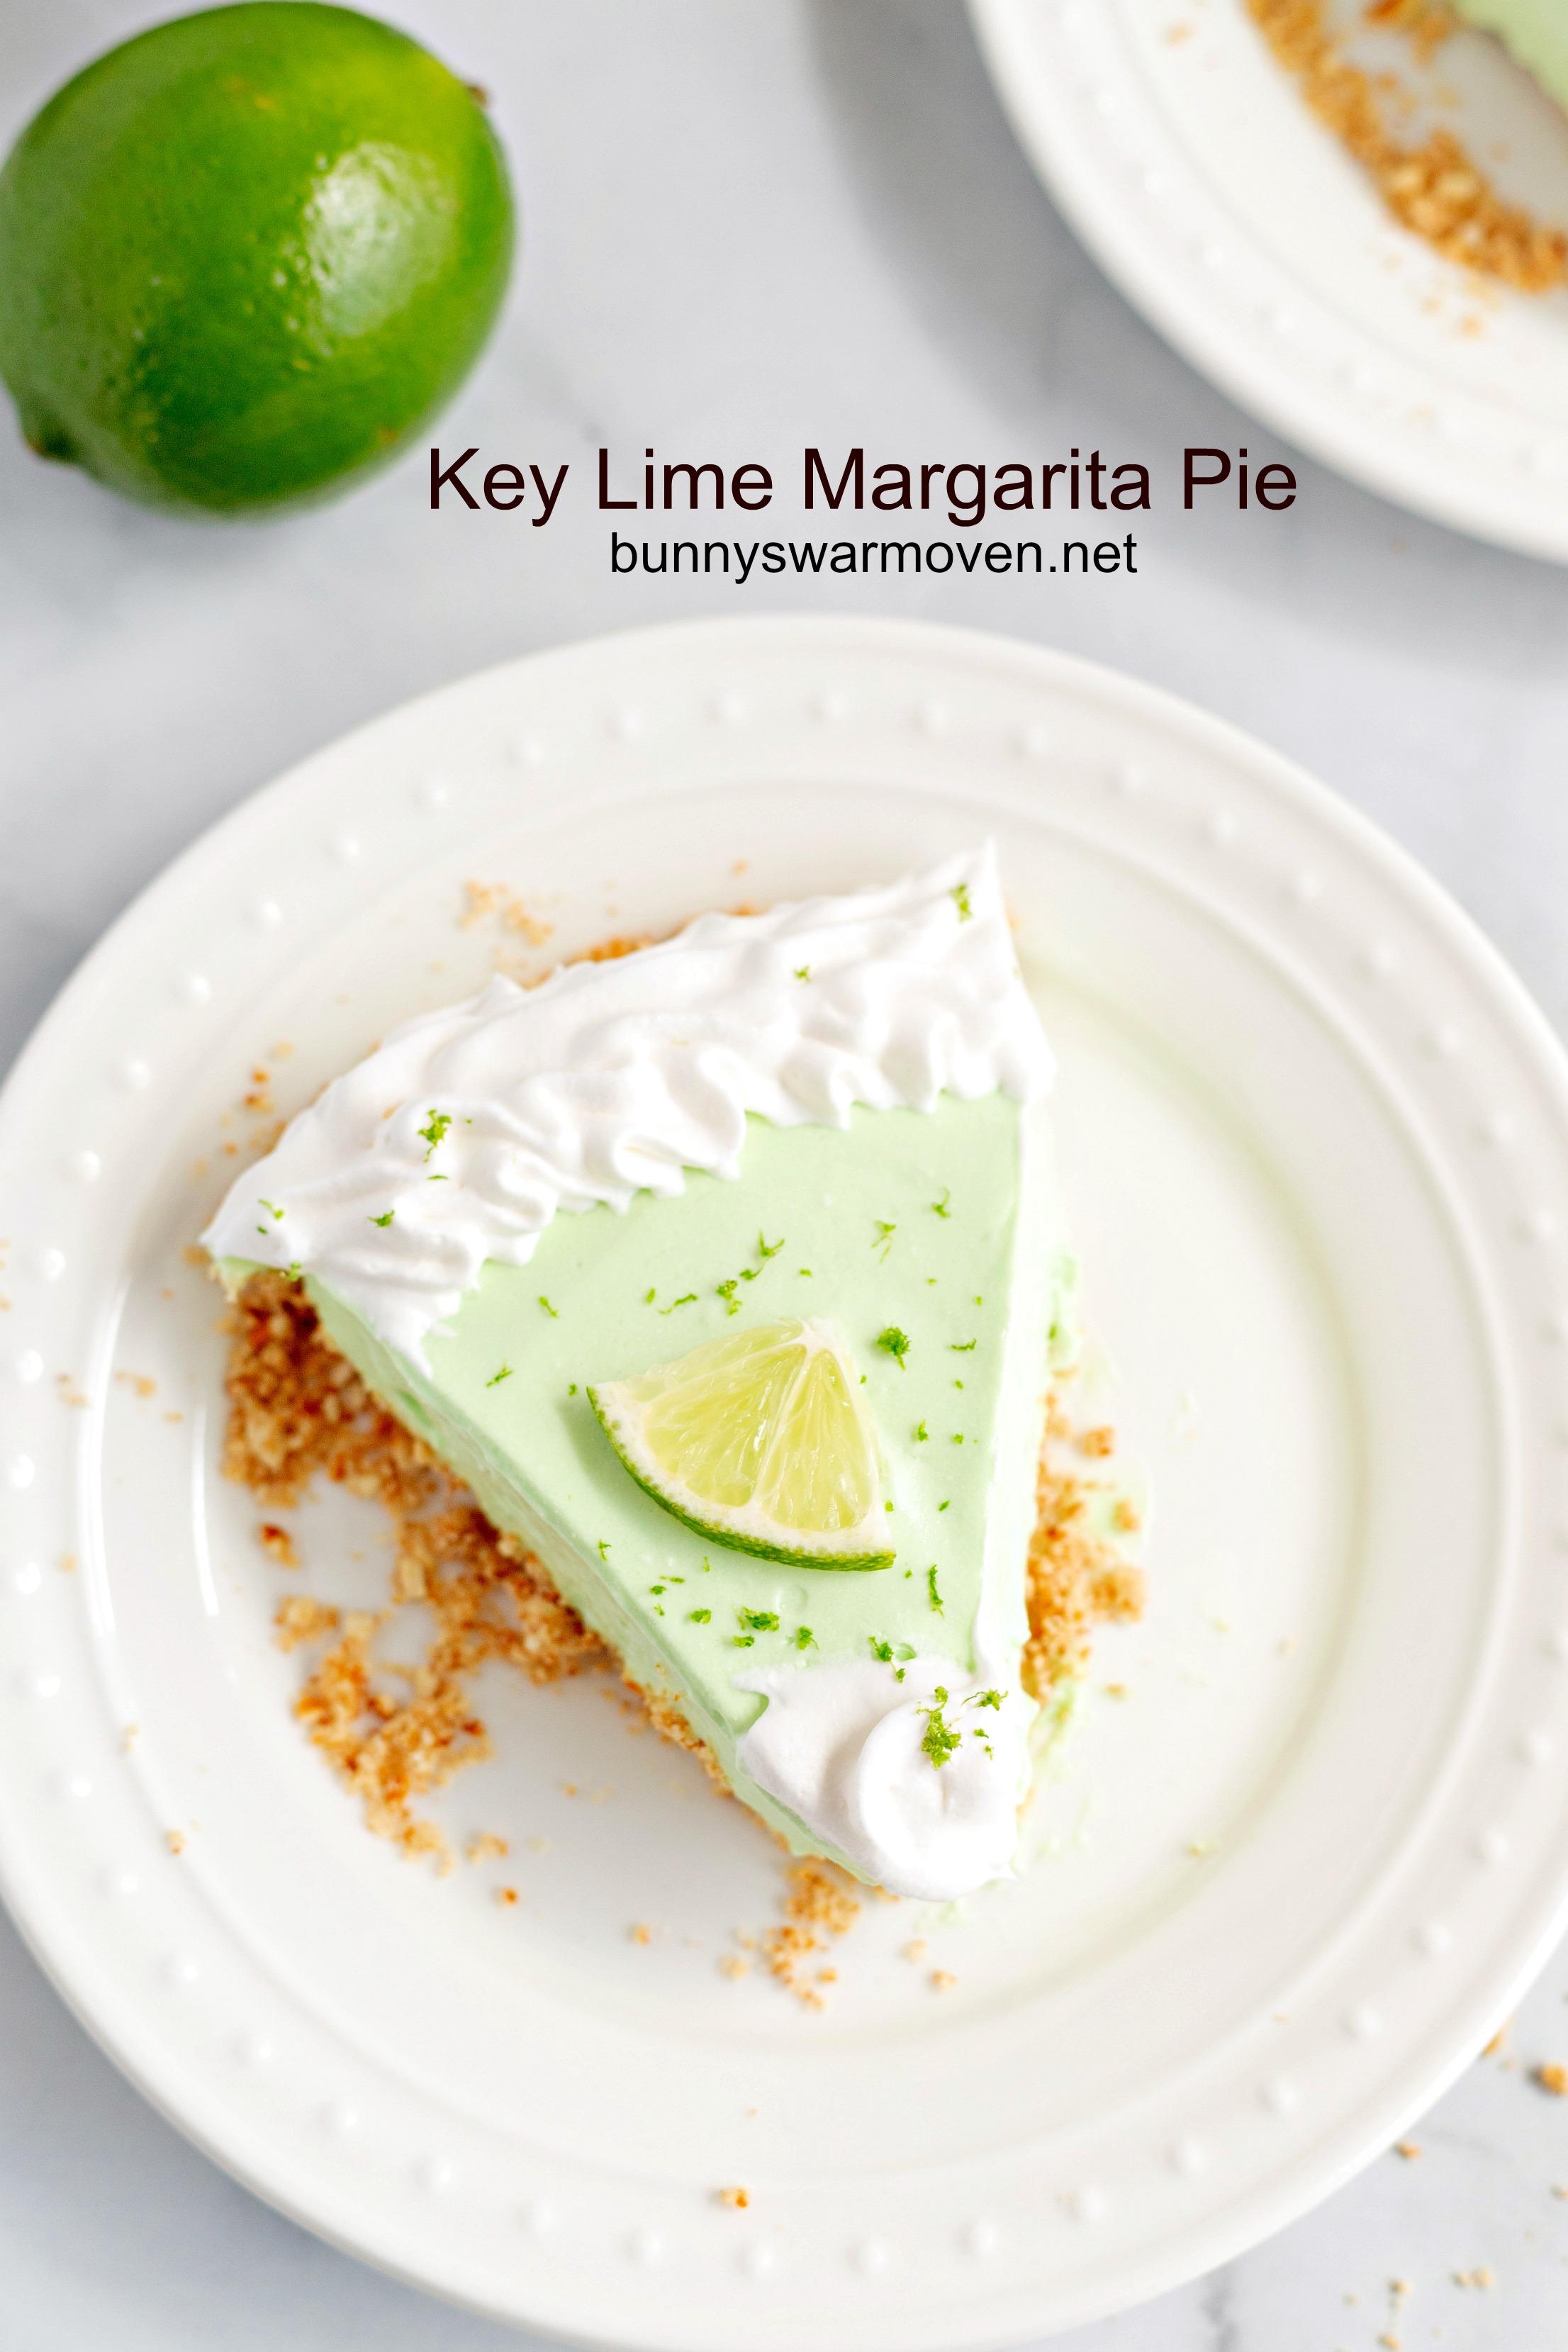 Key Lime Margarita Pie